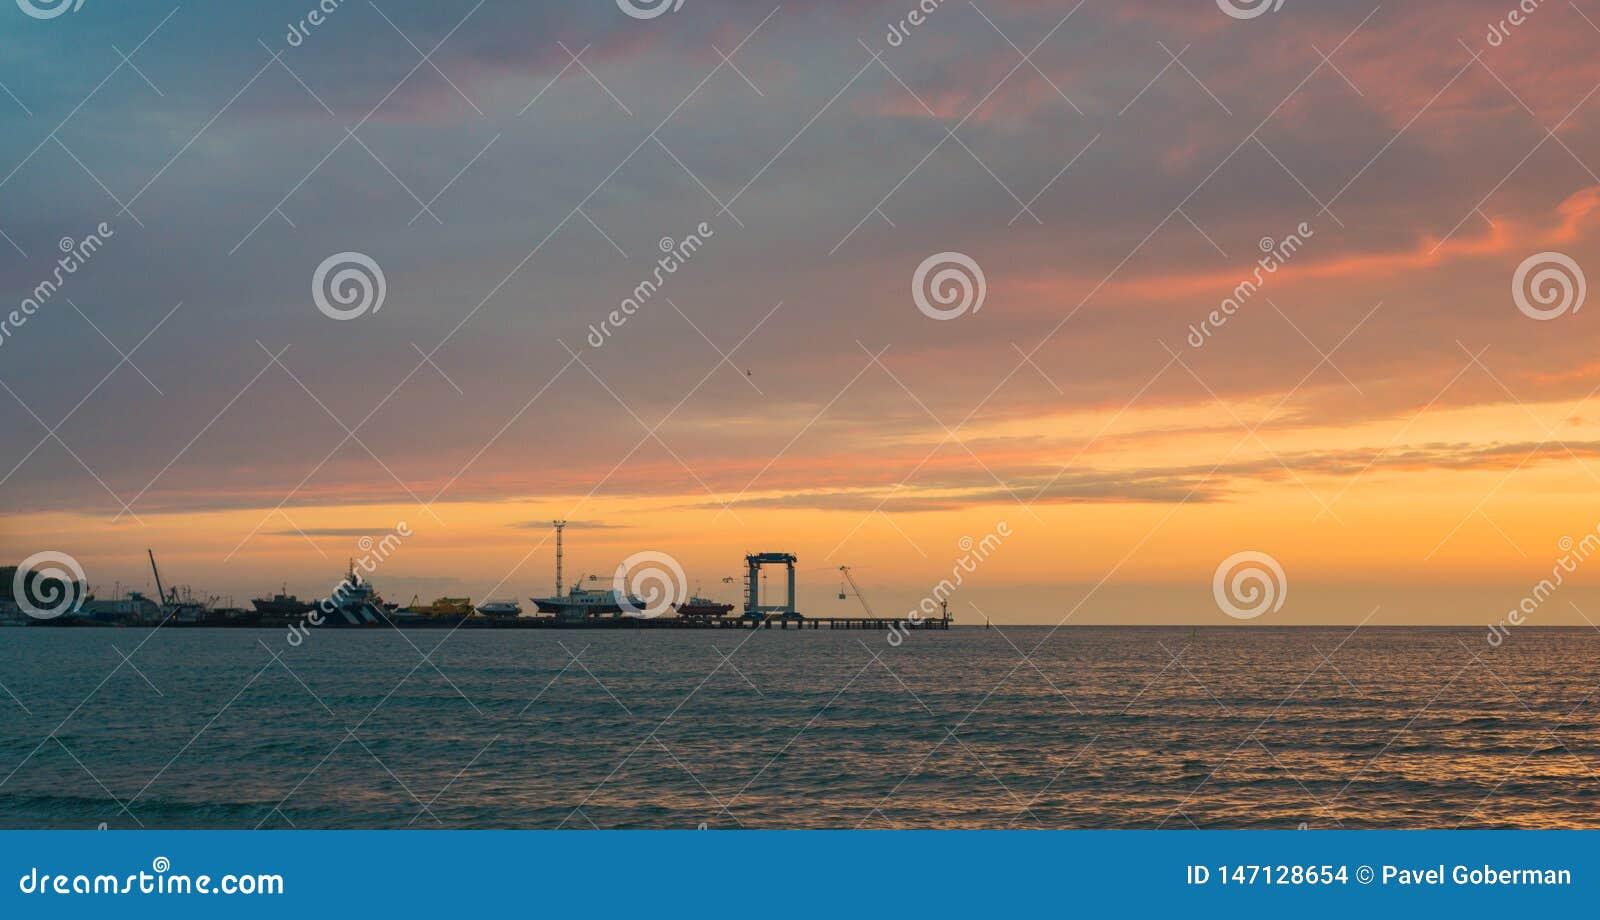 Pi?kna nad s?o?ca nad morzem Anapa, Krasnodar region, Rosja